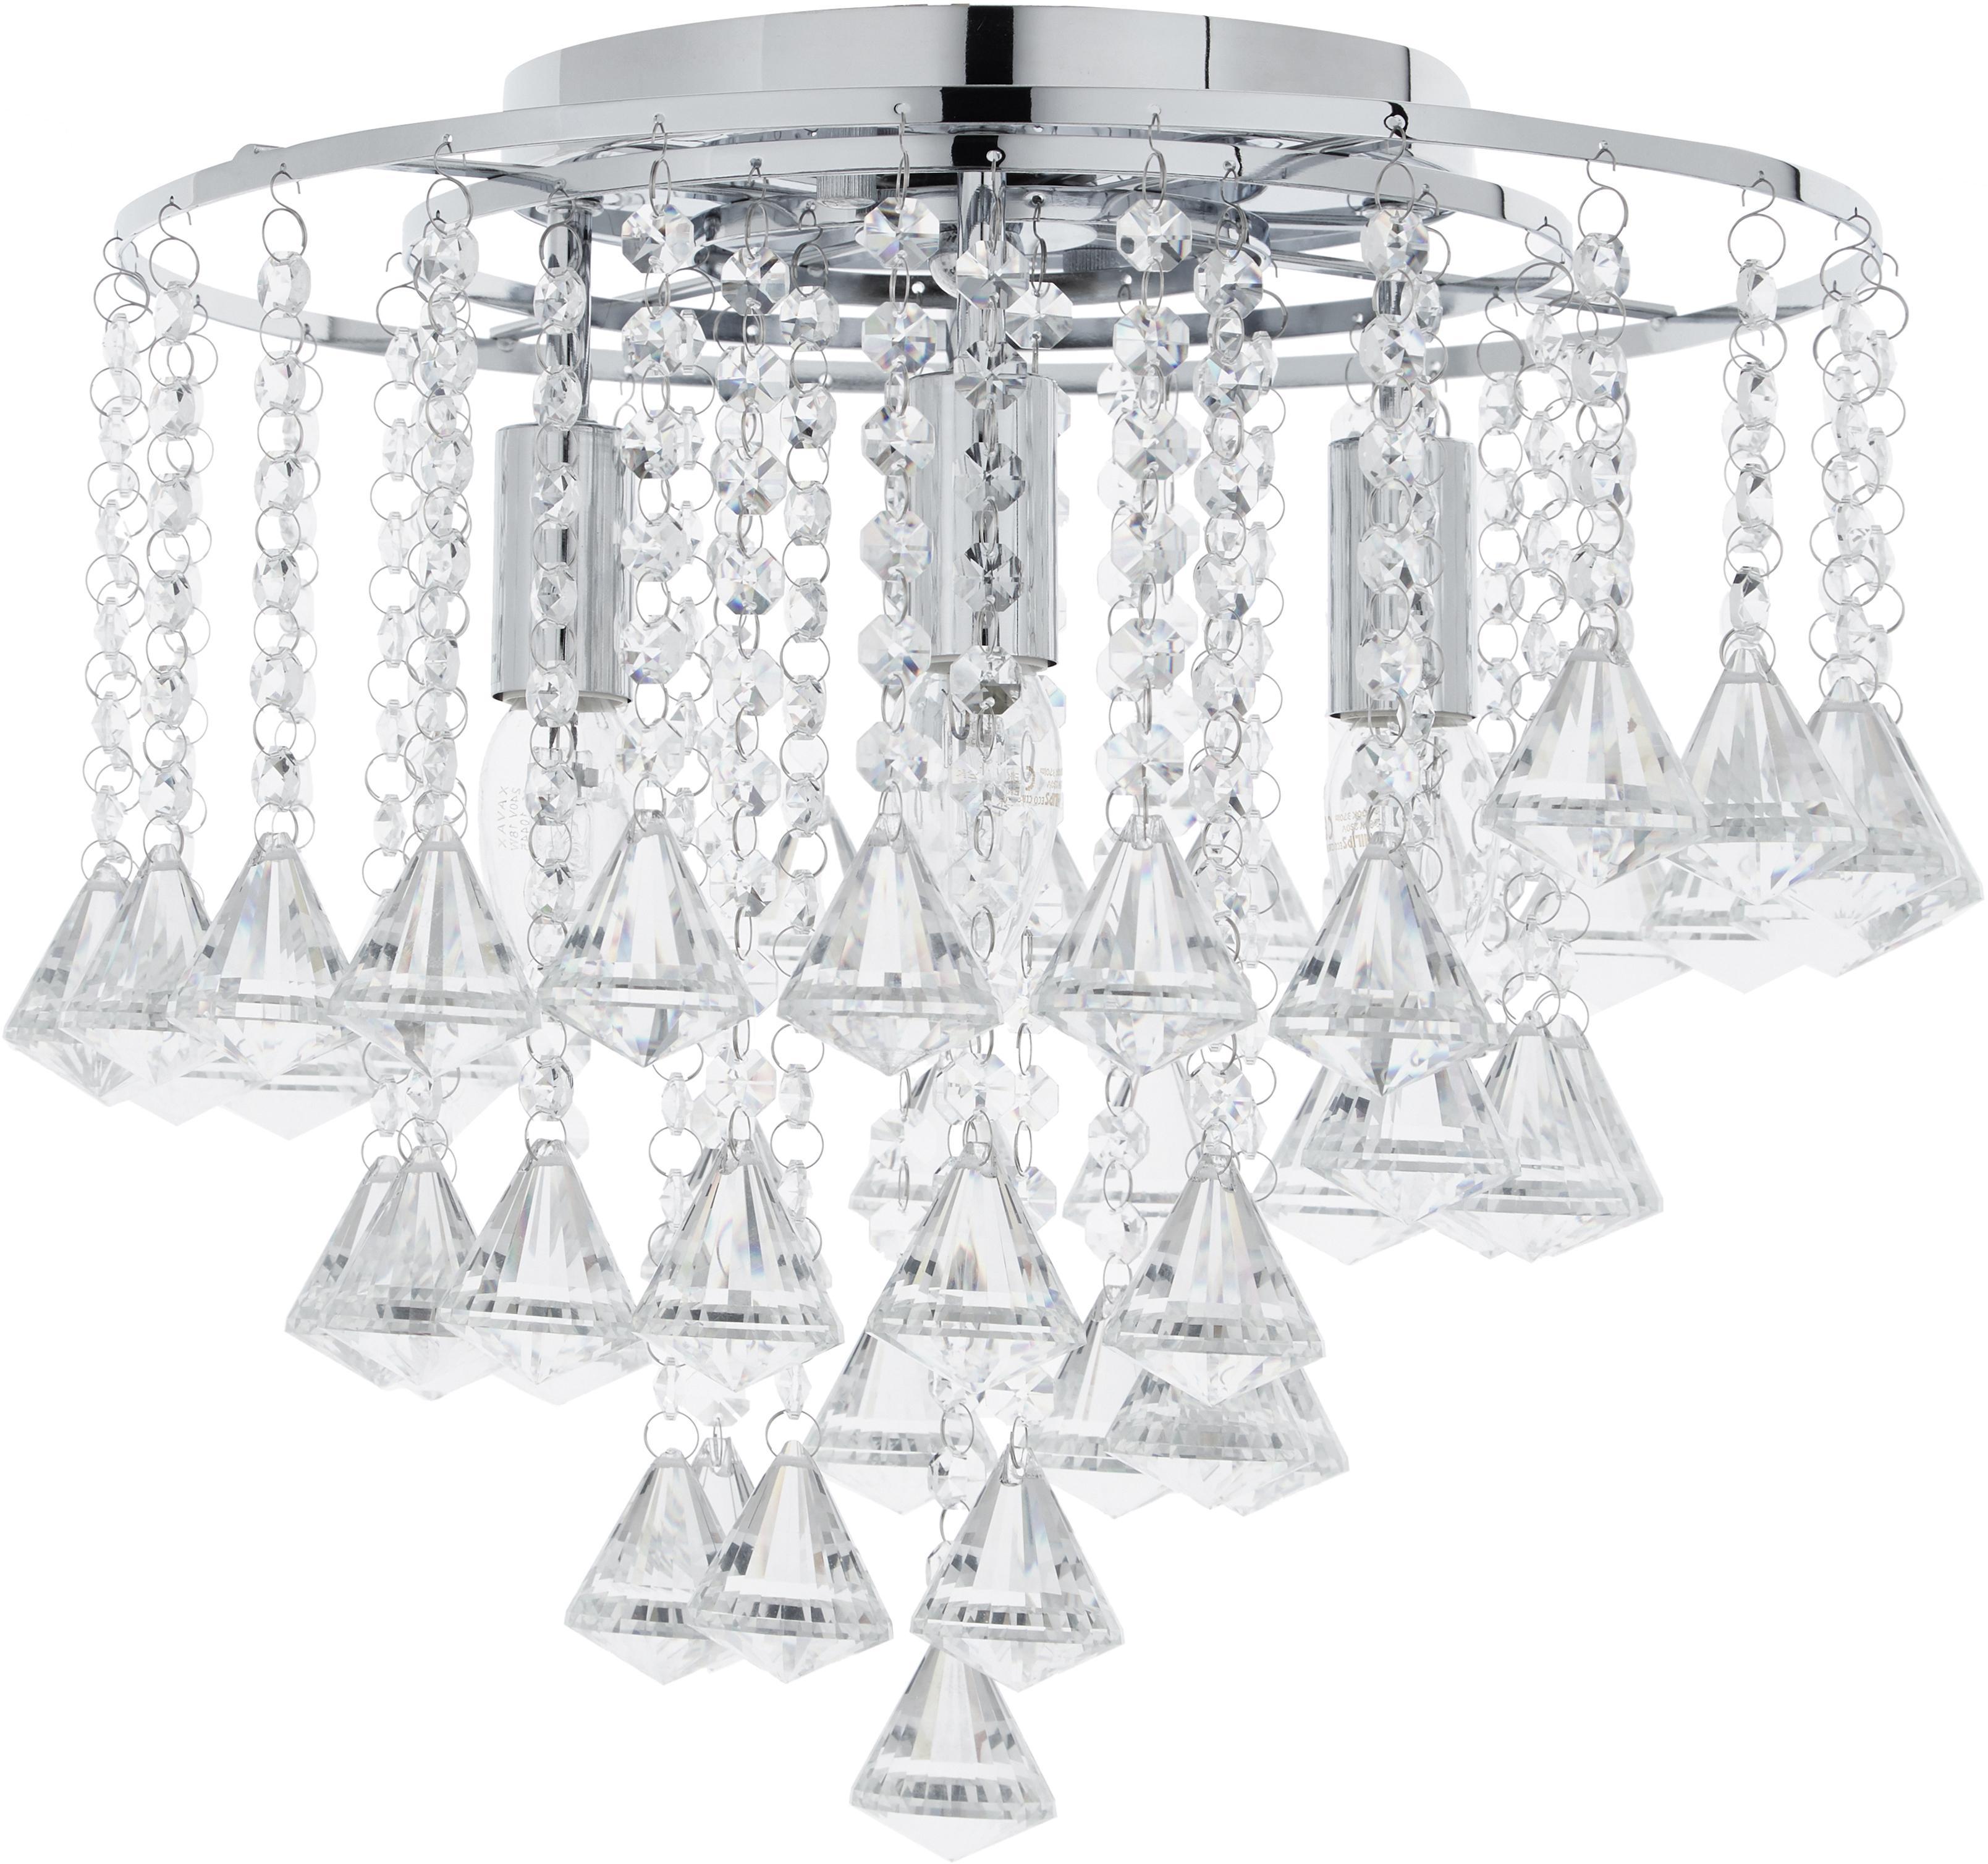 Plafondlamp Dorchester met glaskristallen, Baldakijn: verchroomd metaal, Transparant, chroomkleurig, Ø 50 x H 50 cm